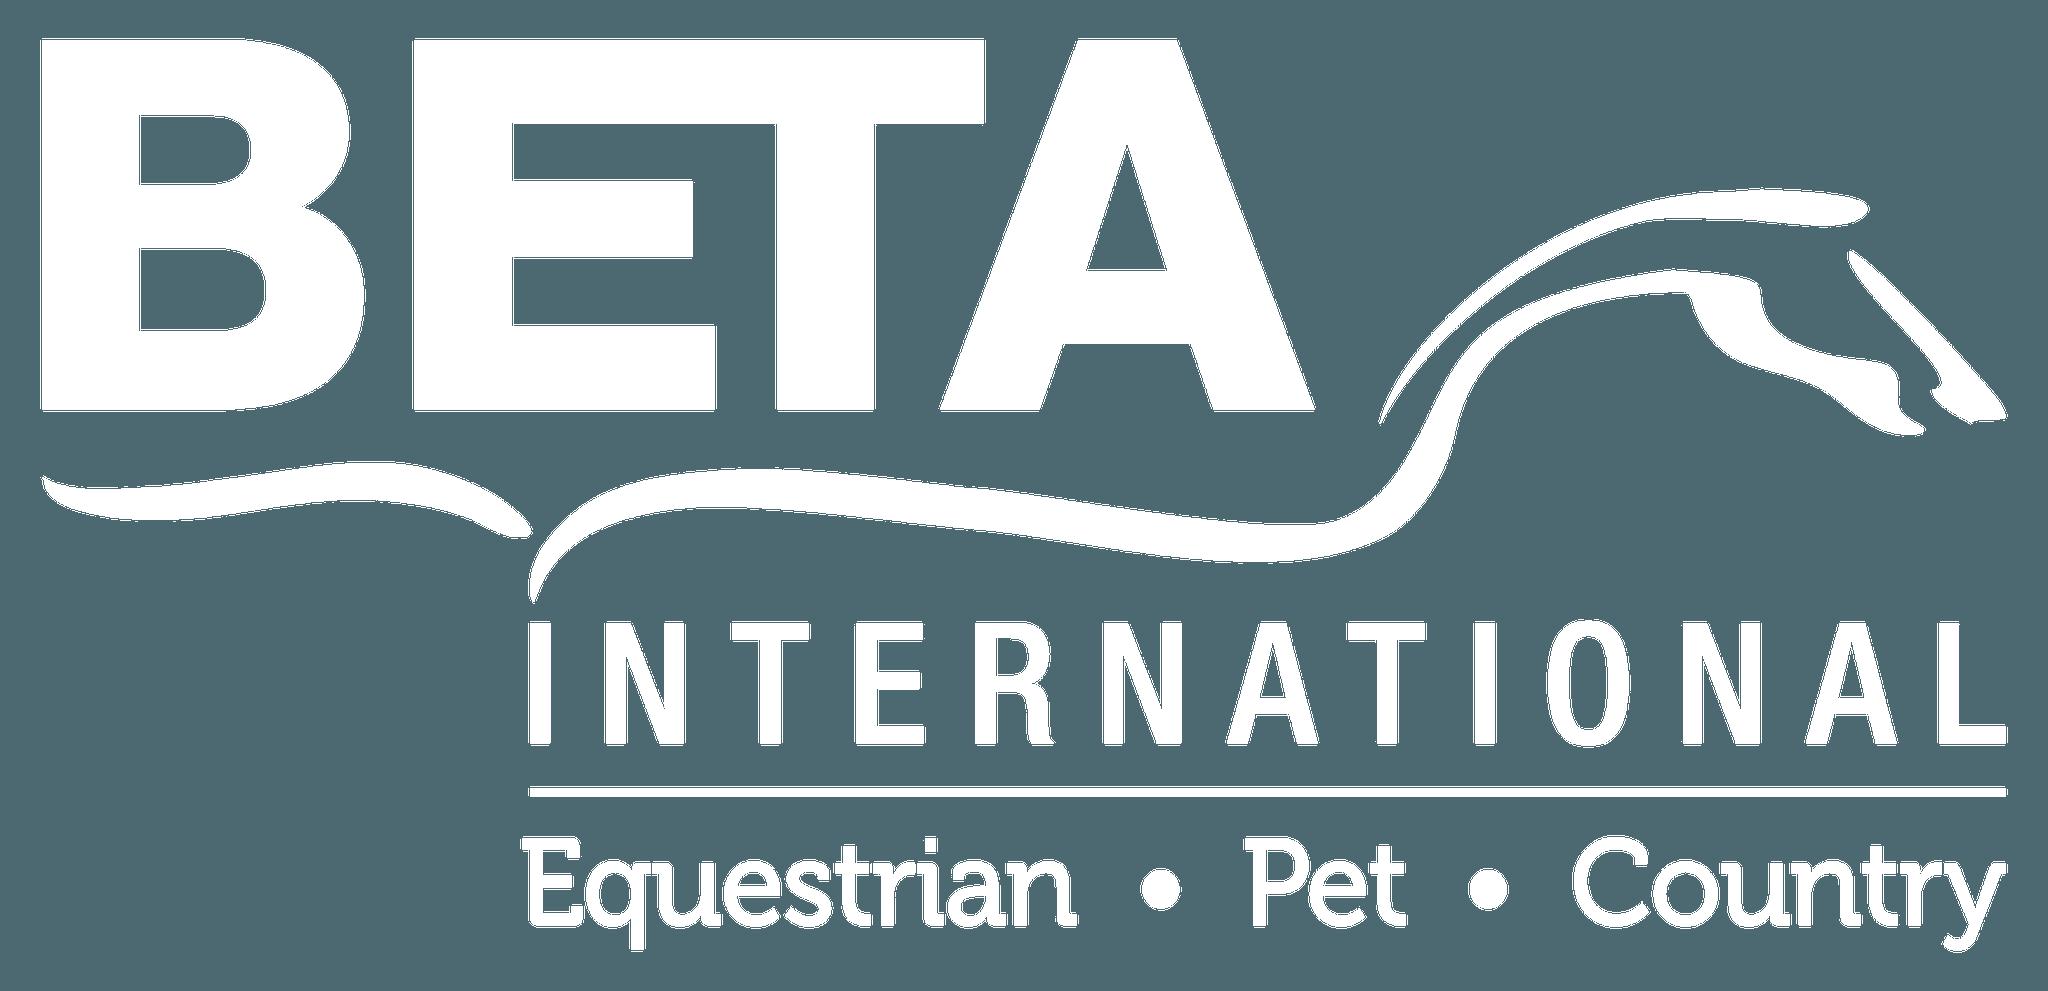 Welcome - BETA International 2020